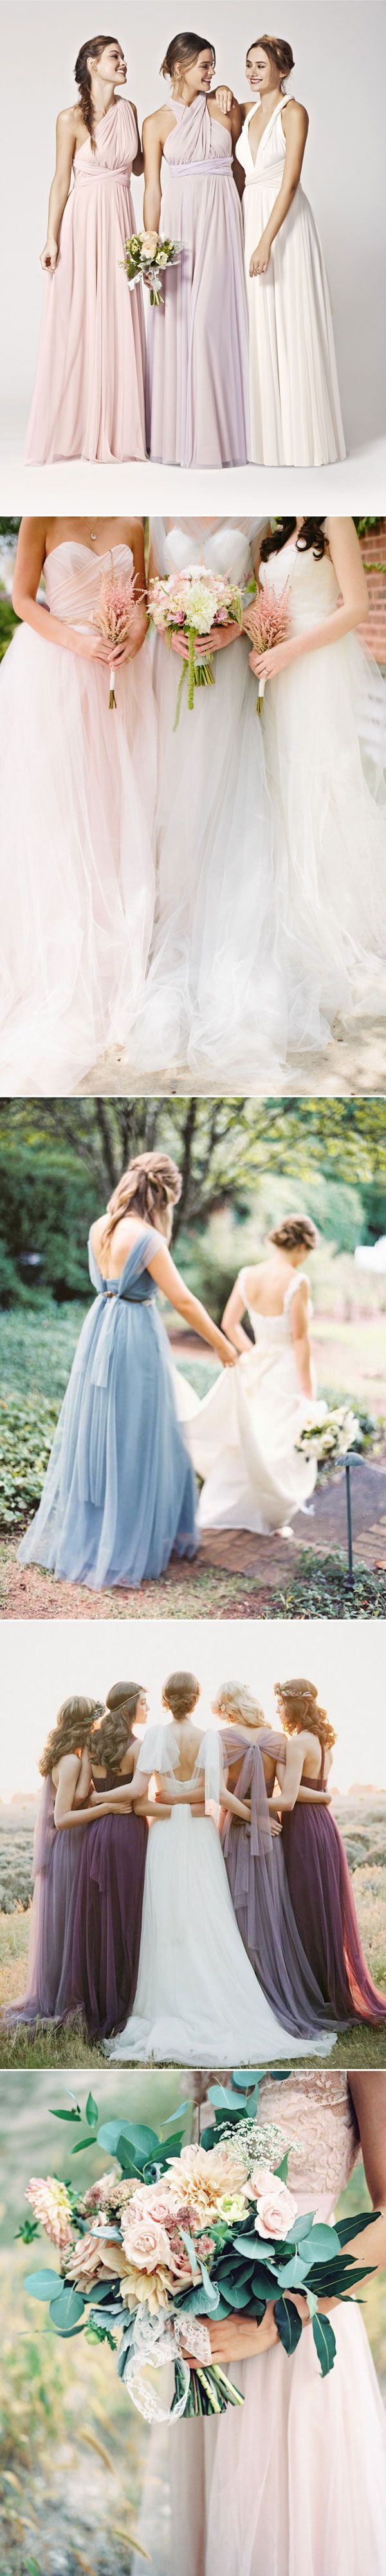 trending long tulle bridesmaid dresses fall 2015